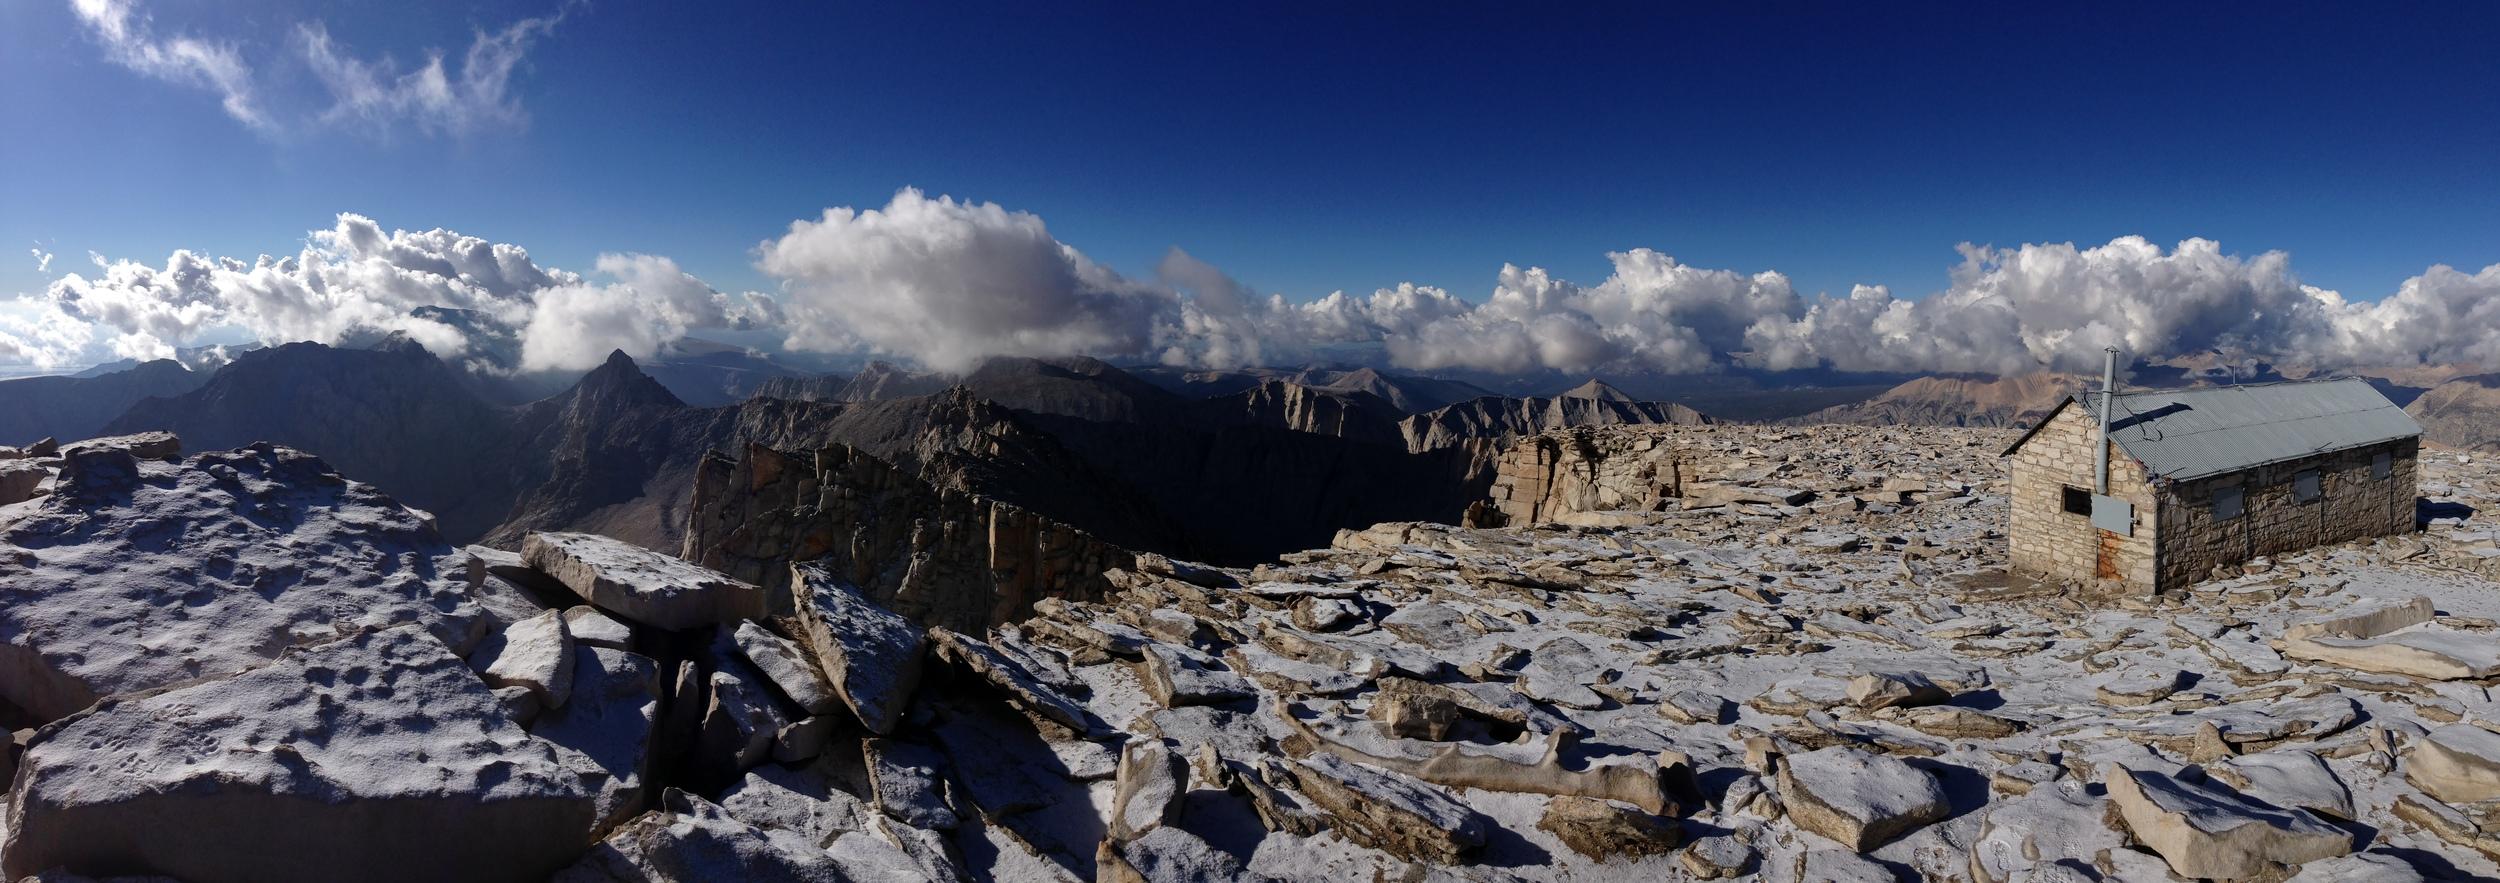 Summit, Mount Whitney, September 21, 2014